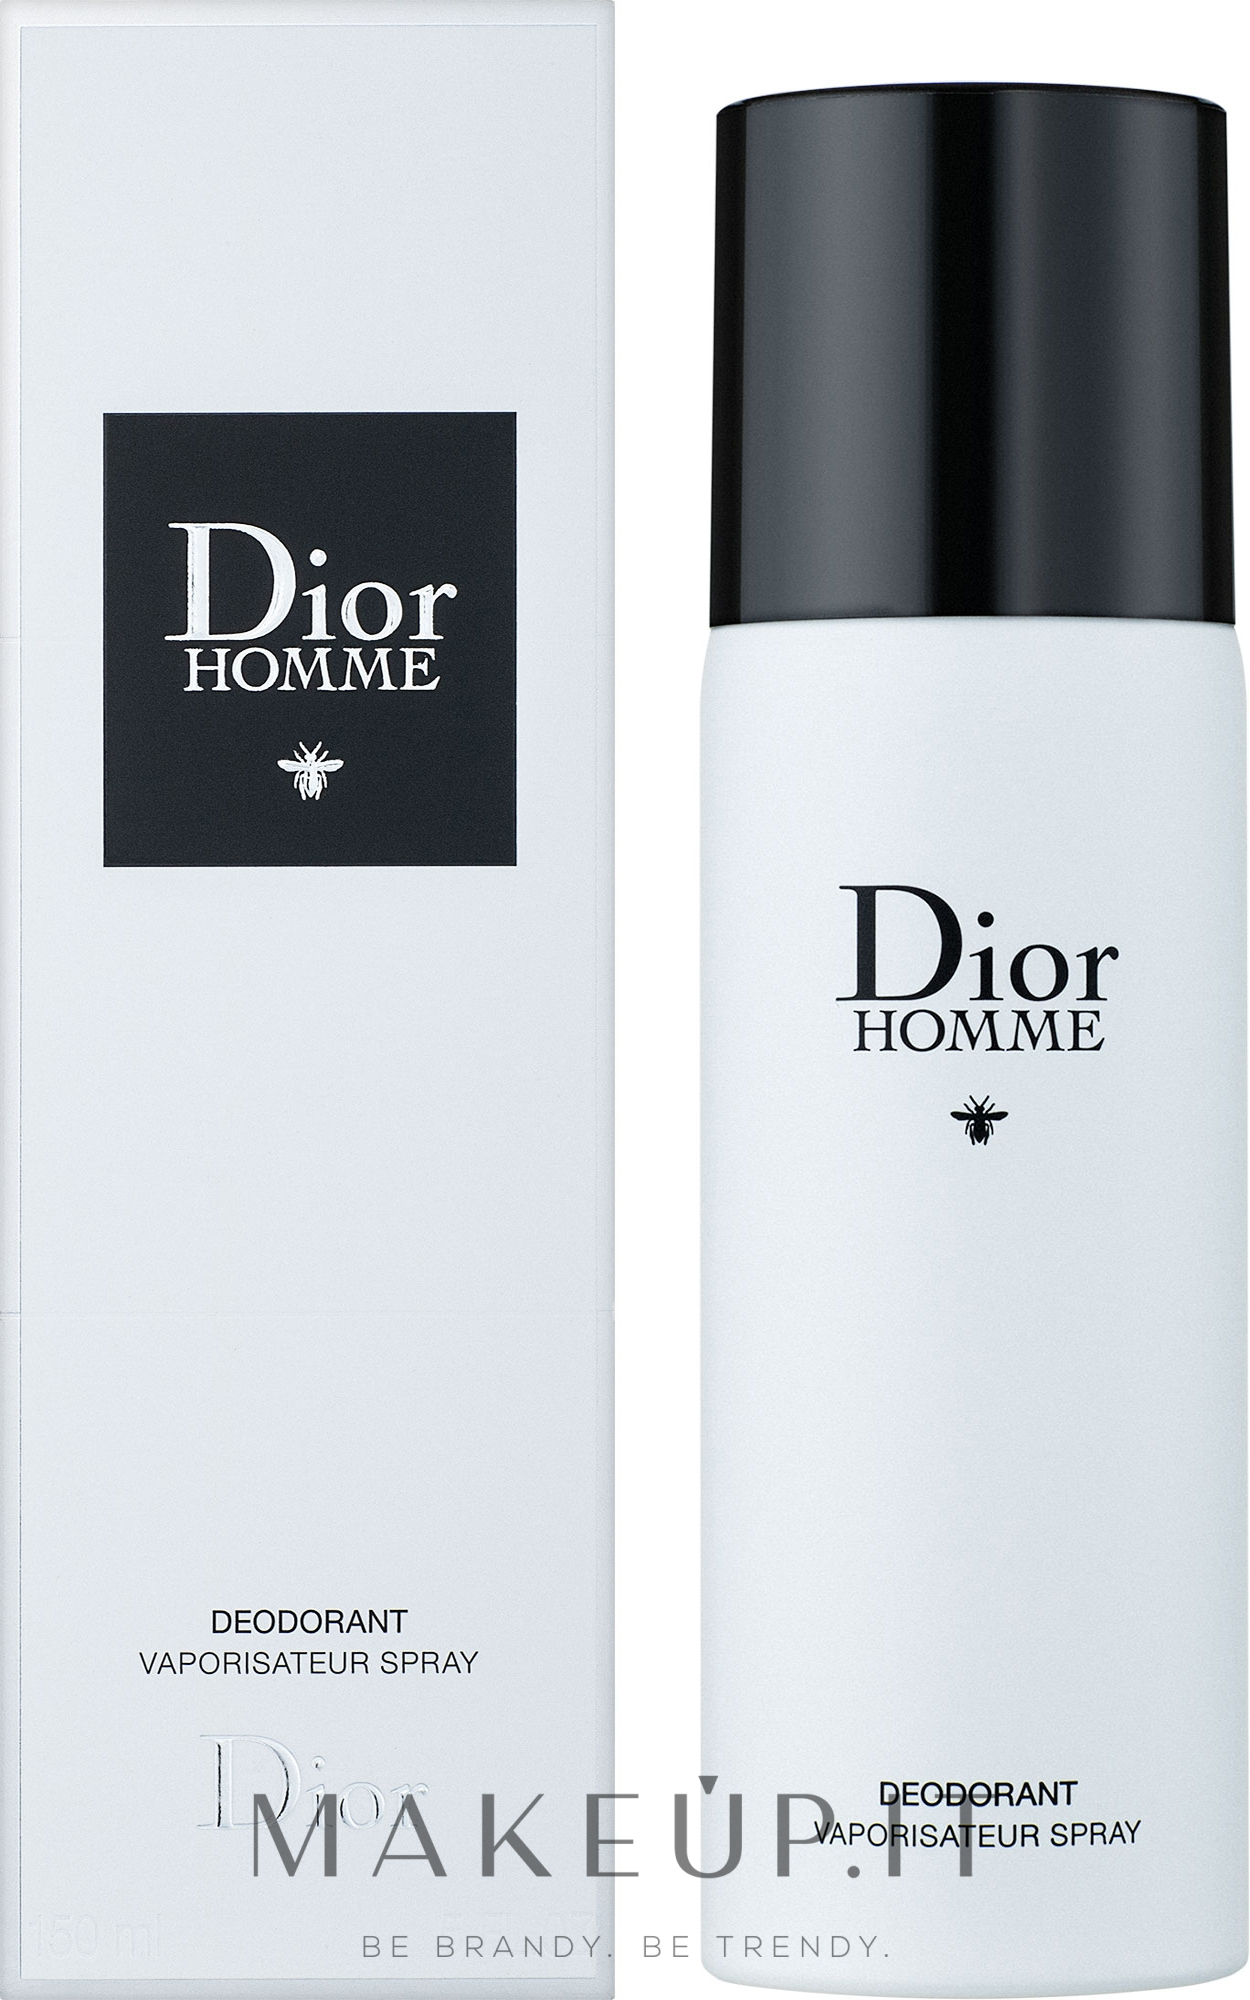 Dior Homme 2020 - Deodorante — foto 150 ml